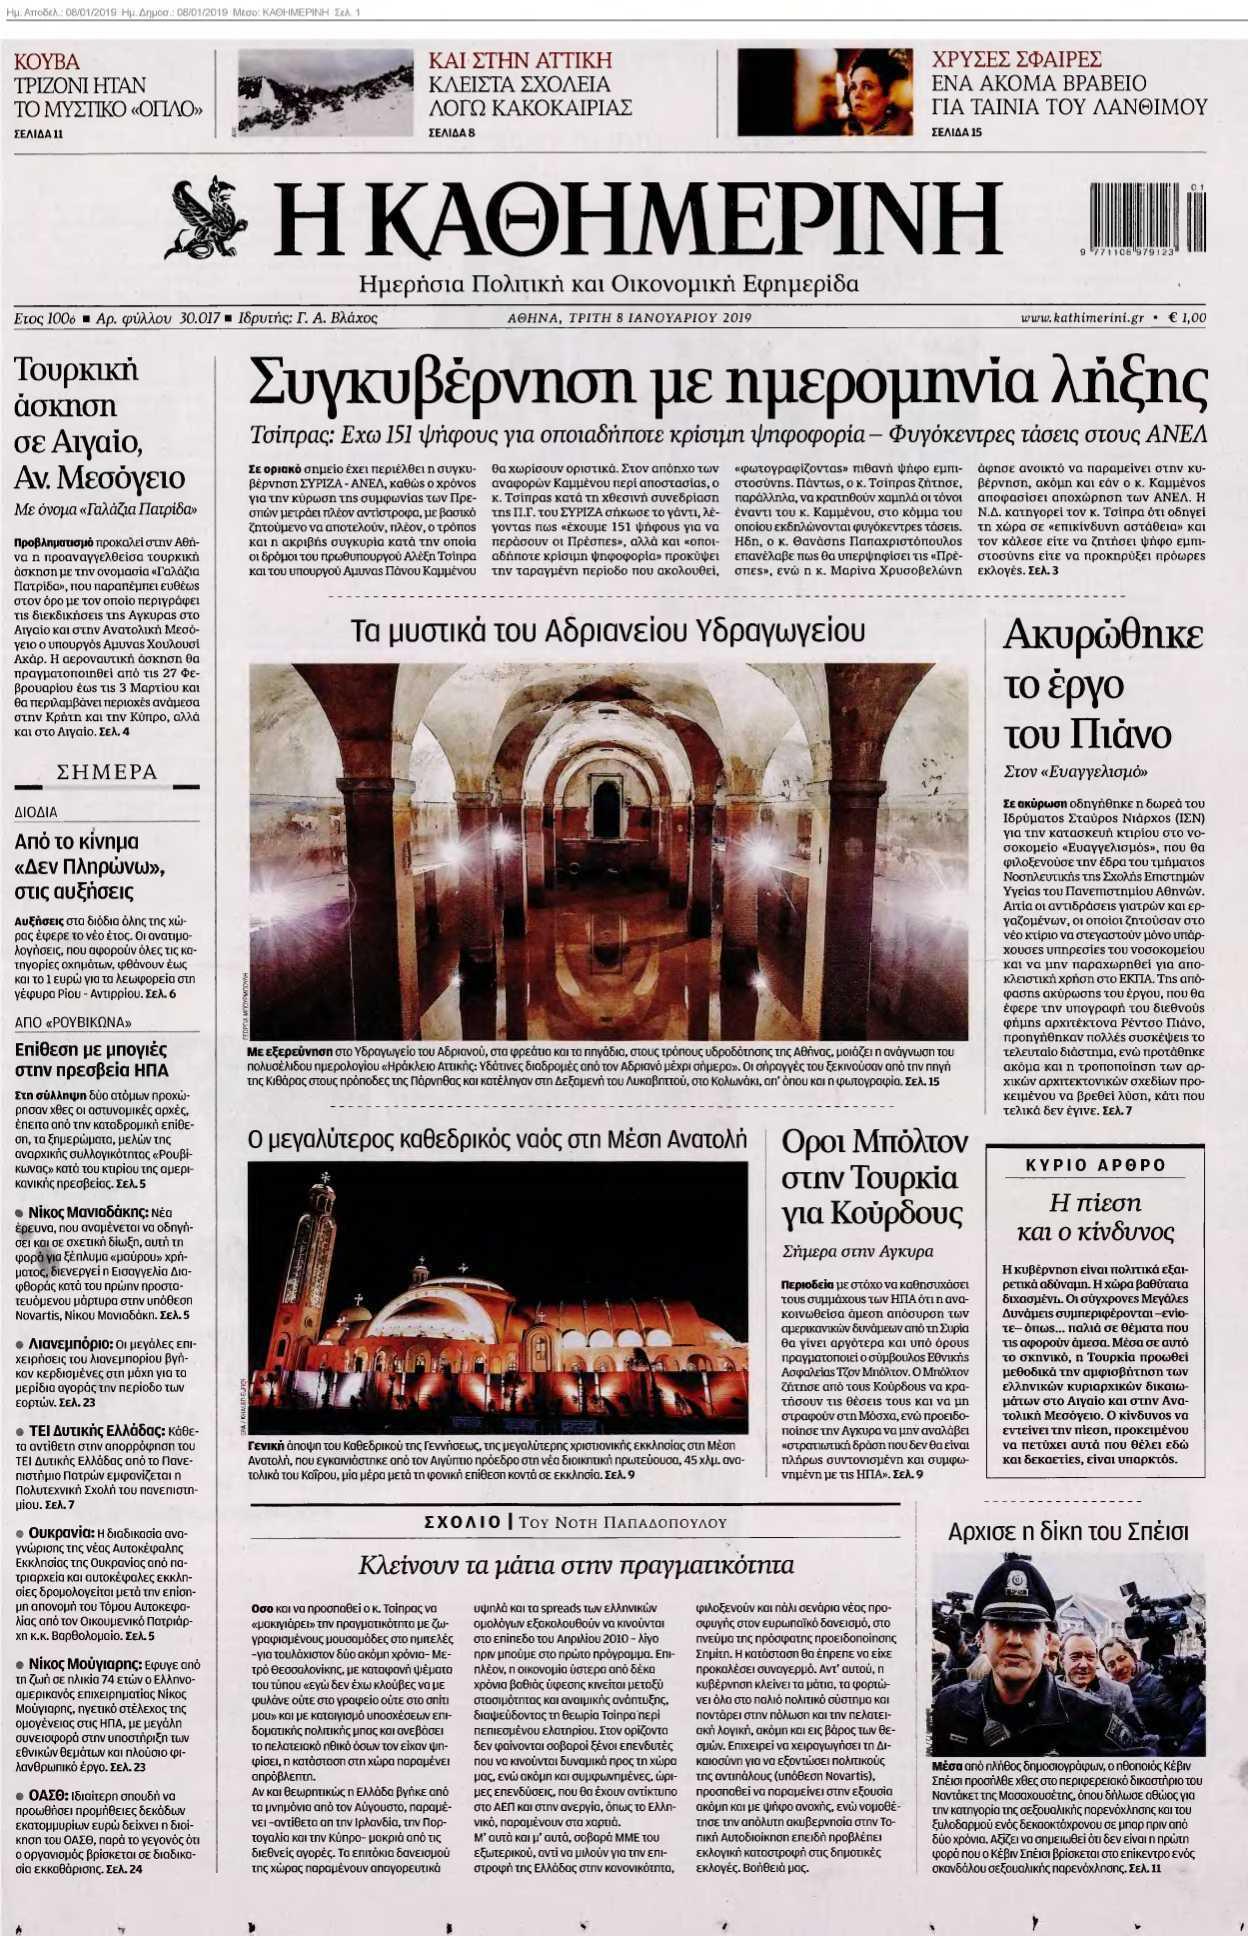 e4abbb824732 Πατήστε επόμενη ή προηγούμενη εφημερίδα για να δείτε τα υπόλοπα πρωτοσελίδα  της κατηγορίας εφημερίδες. Πατήστε επόμενη ή προηγούμενη ημερομηνία για να  δείτε ...